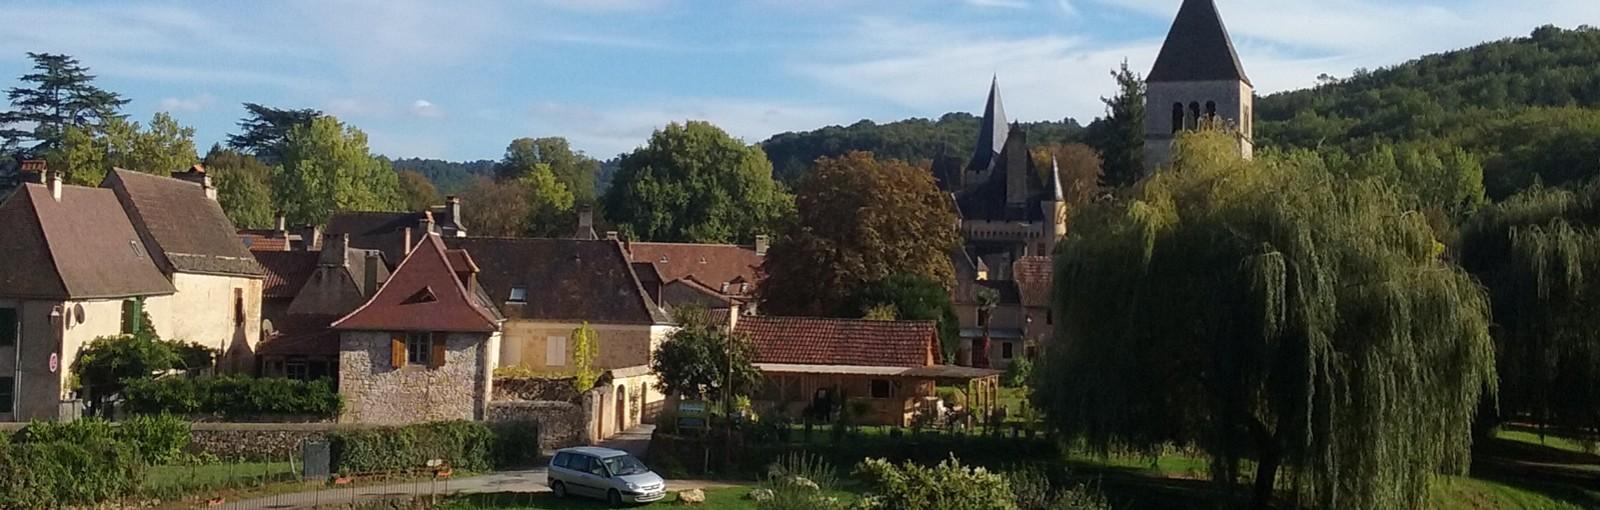 Tours Multi-day tours from Bordeaux or Sarlat - Dordogne & Aquitaine - Regional tours